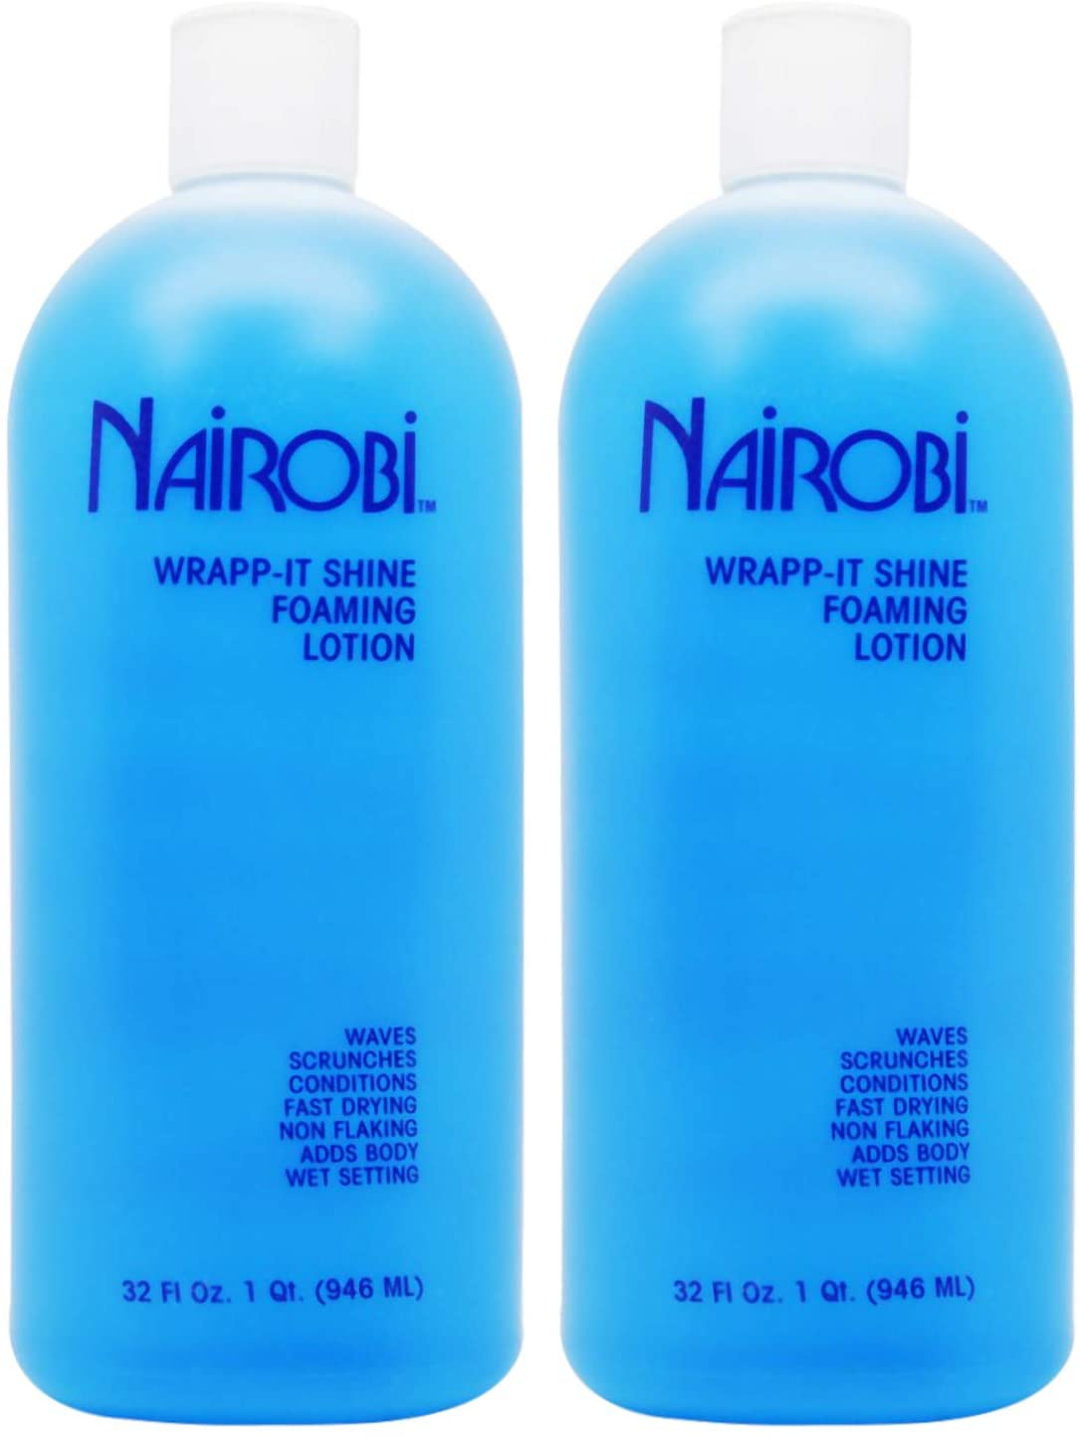 Amazon Com Nairobi Wrapp It Shine Foaming Lotion 32oz Pack Of 2 Health Personal Care